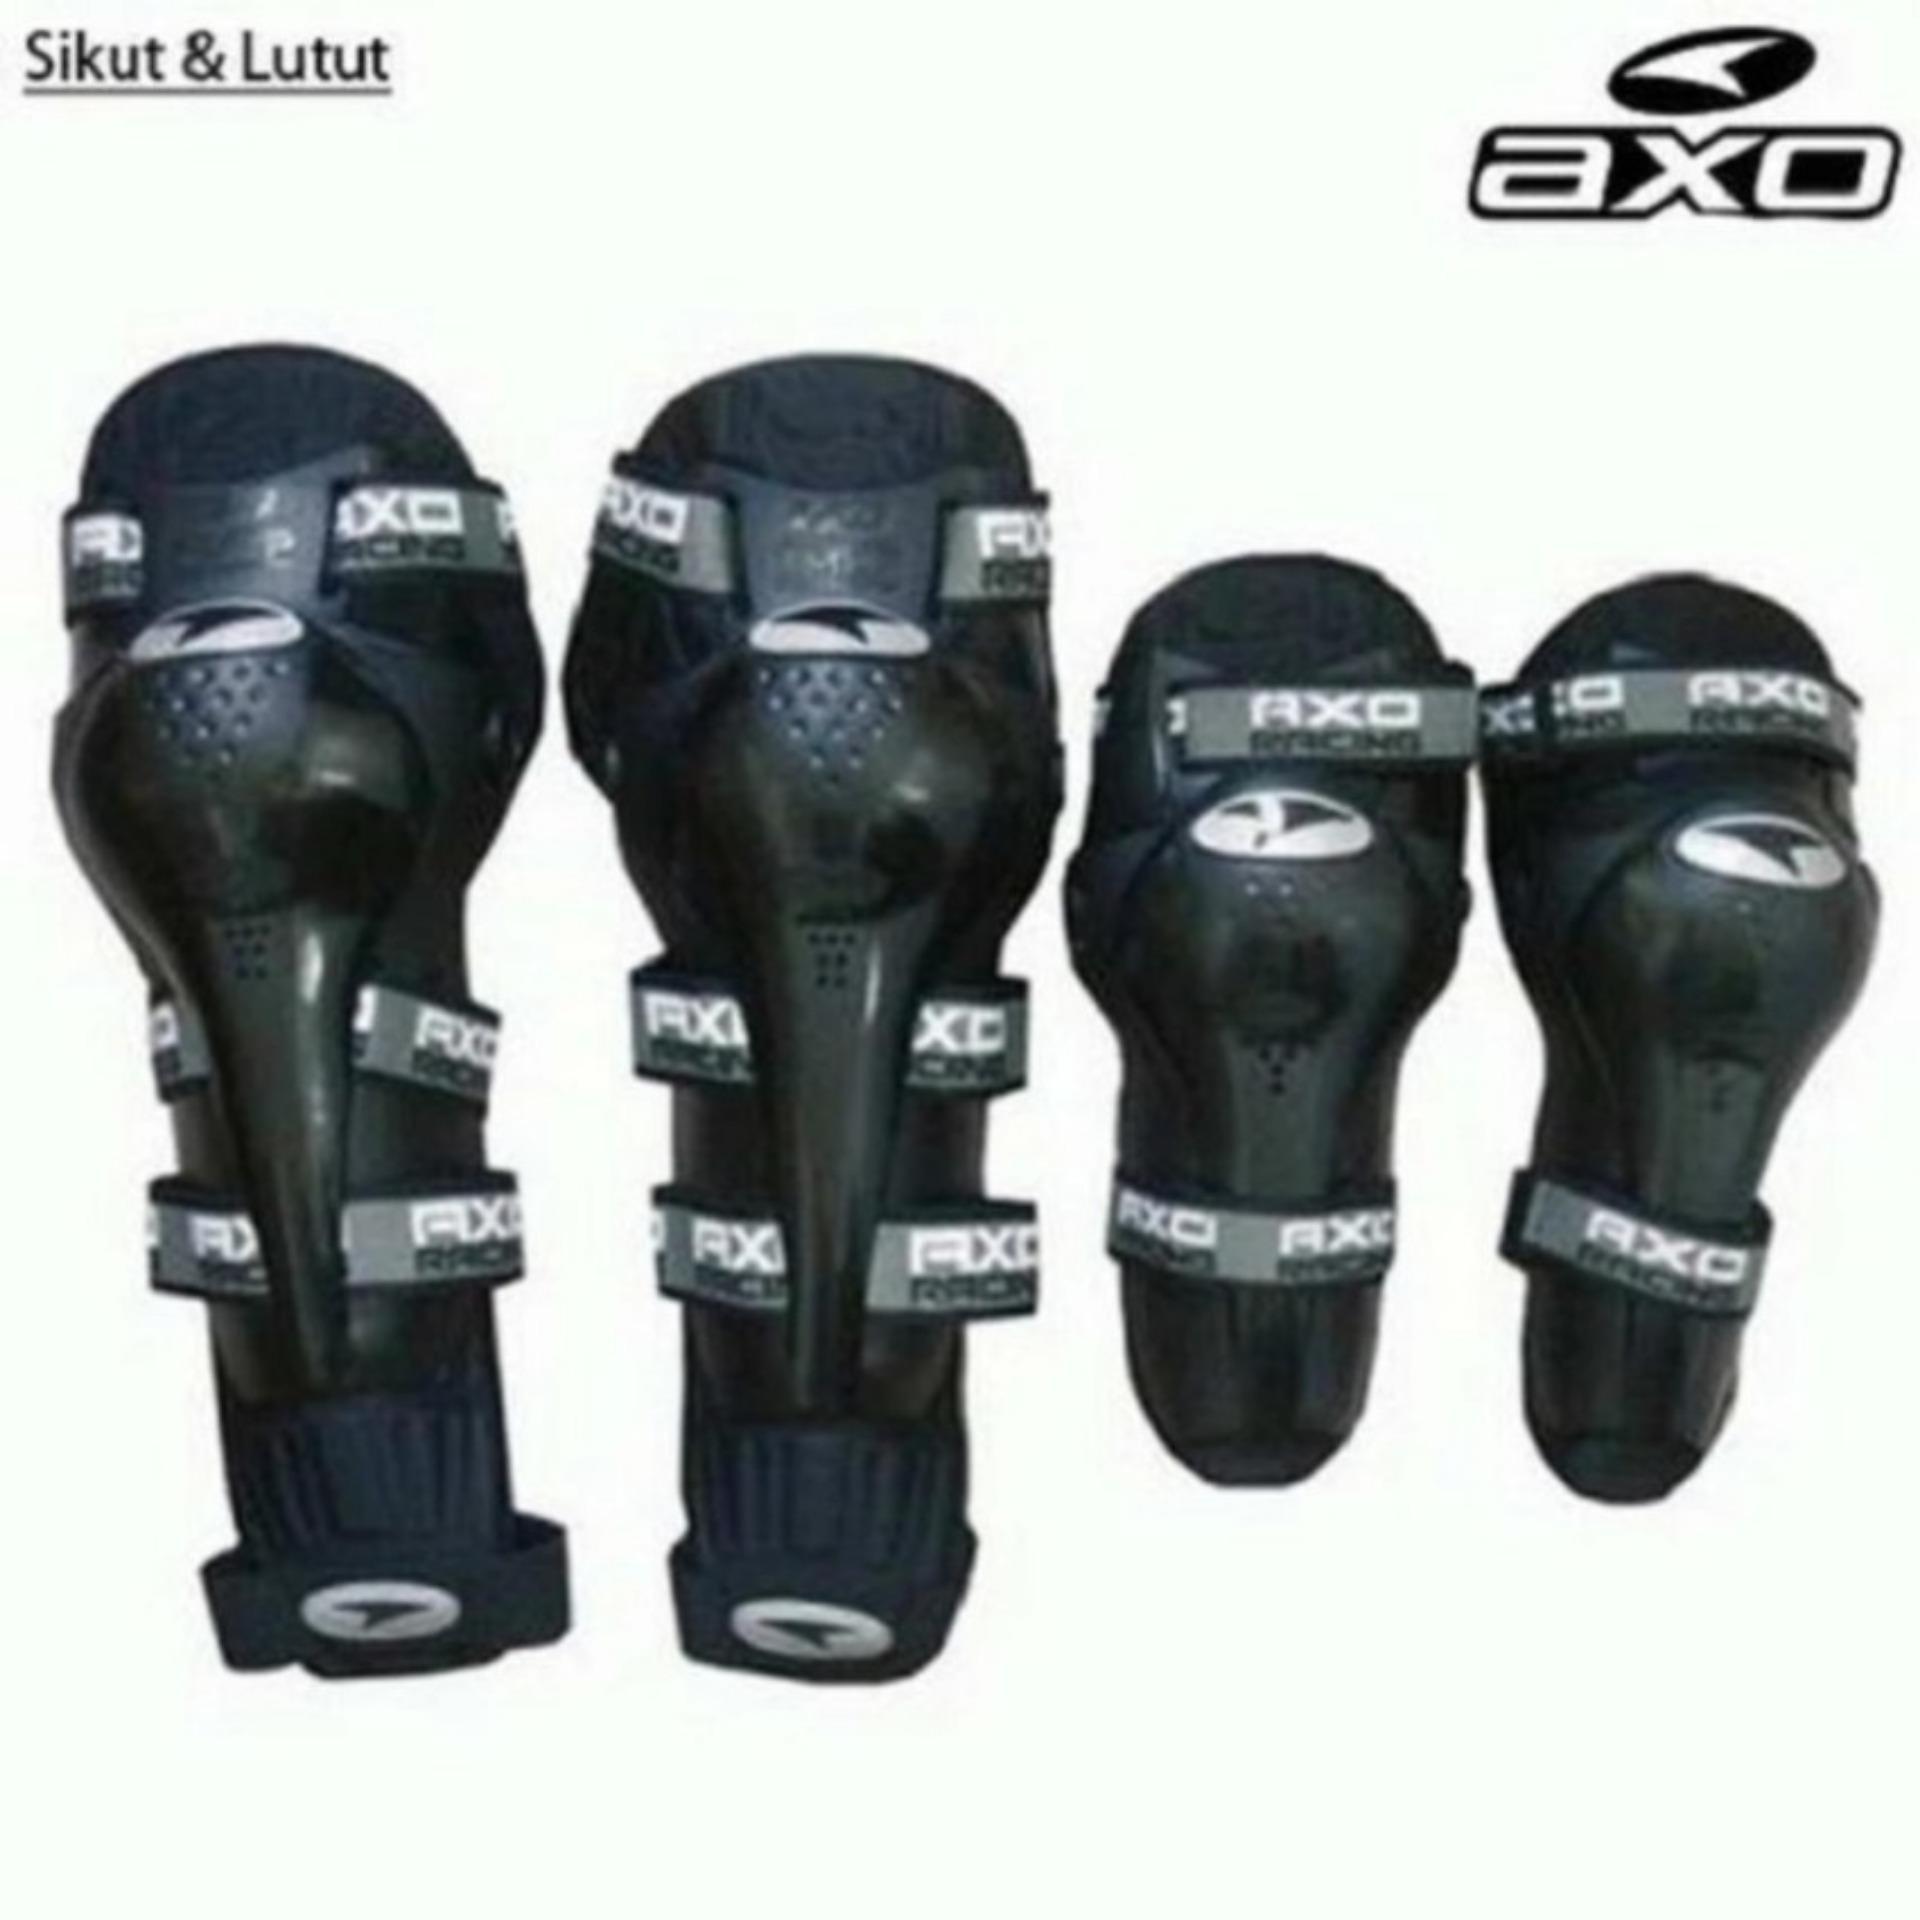 Fox Titan Body Protector Rompi Vest Motor Touring Tour Biker Bike Monster Energi Review Of Axo Decker Deker Dekker Pelindung Lutut Knee Belanja